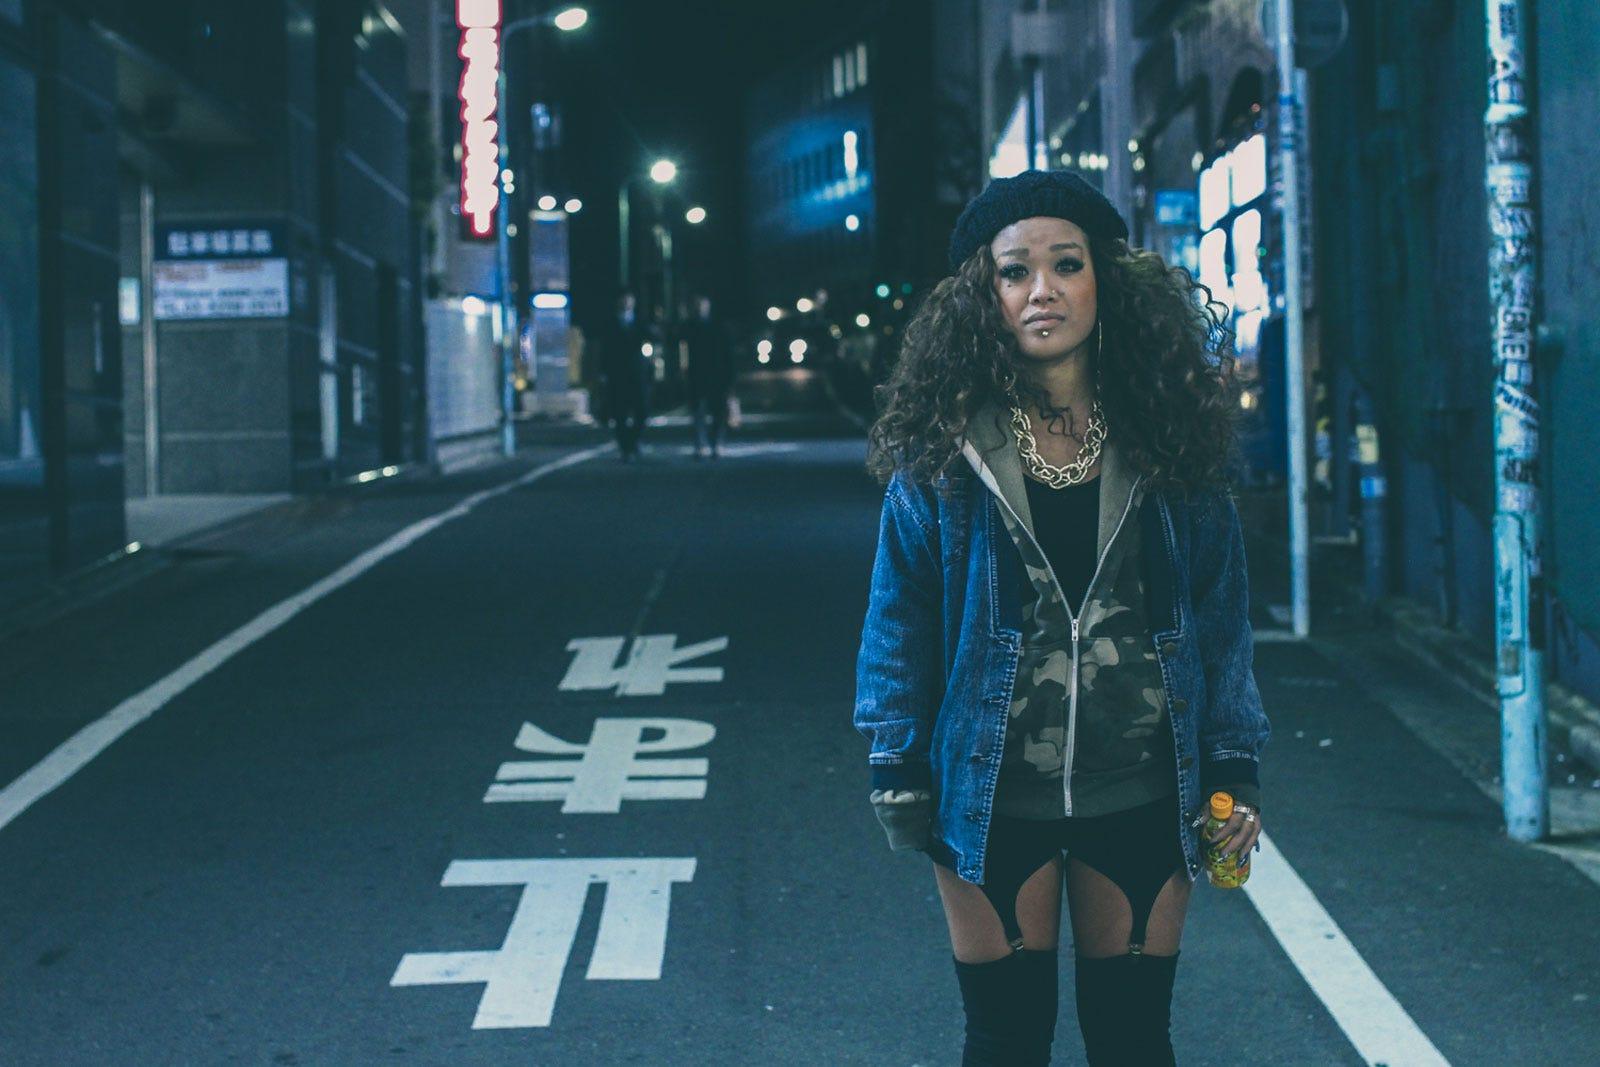 Japanese B-Style Black Face Asian Fashion